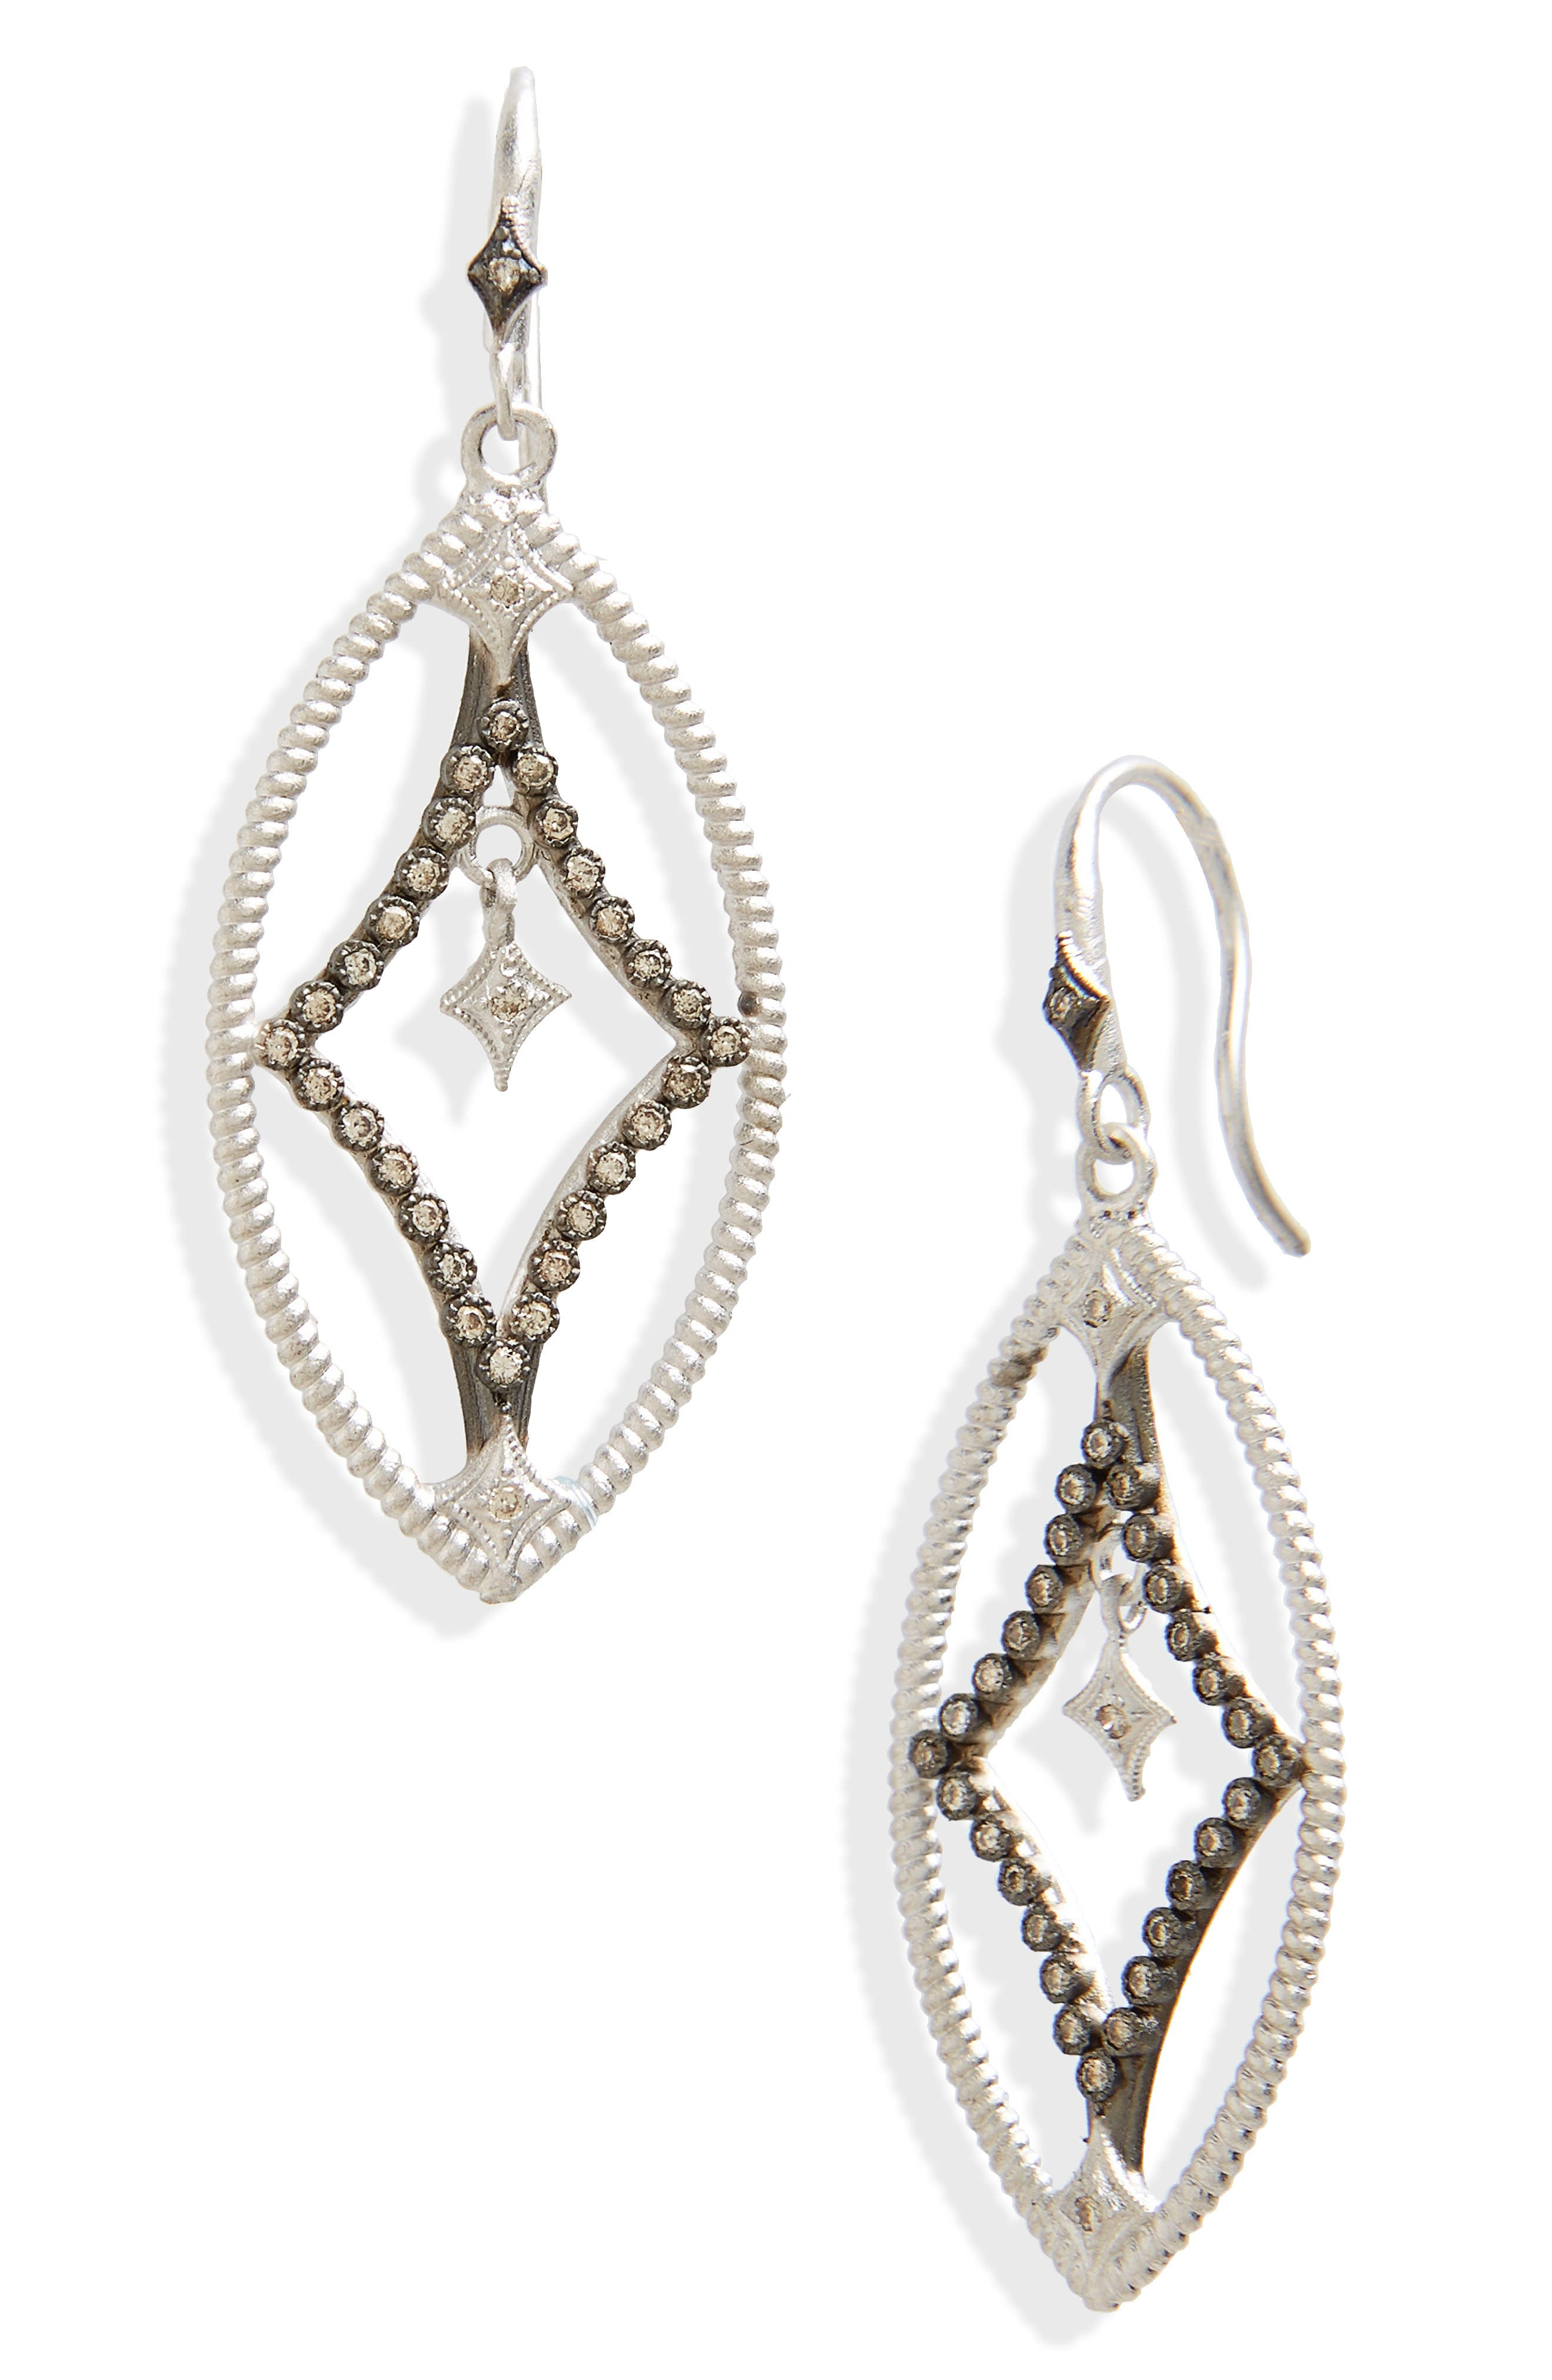 New World Crivelli Drop Earrings,                             Main thumbnail 1, color,                             Silver